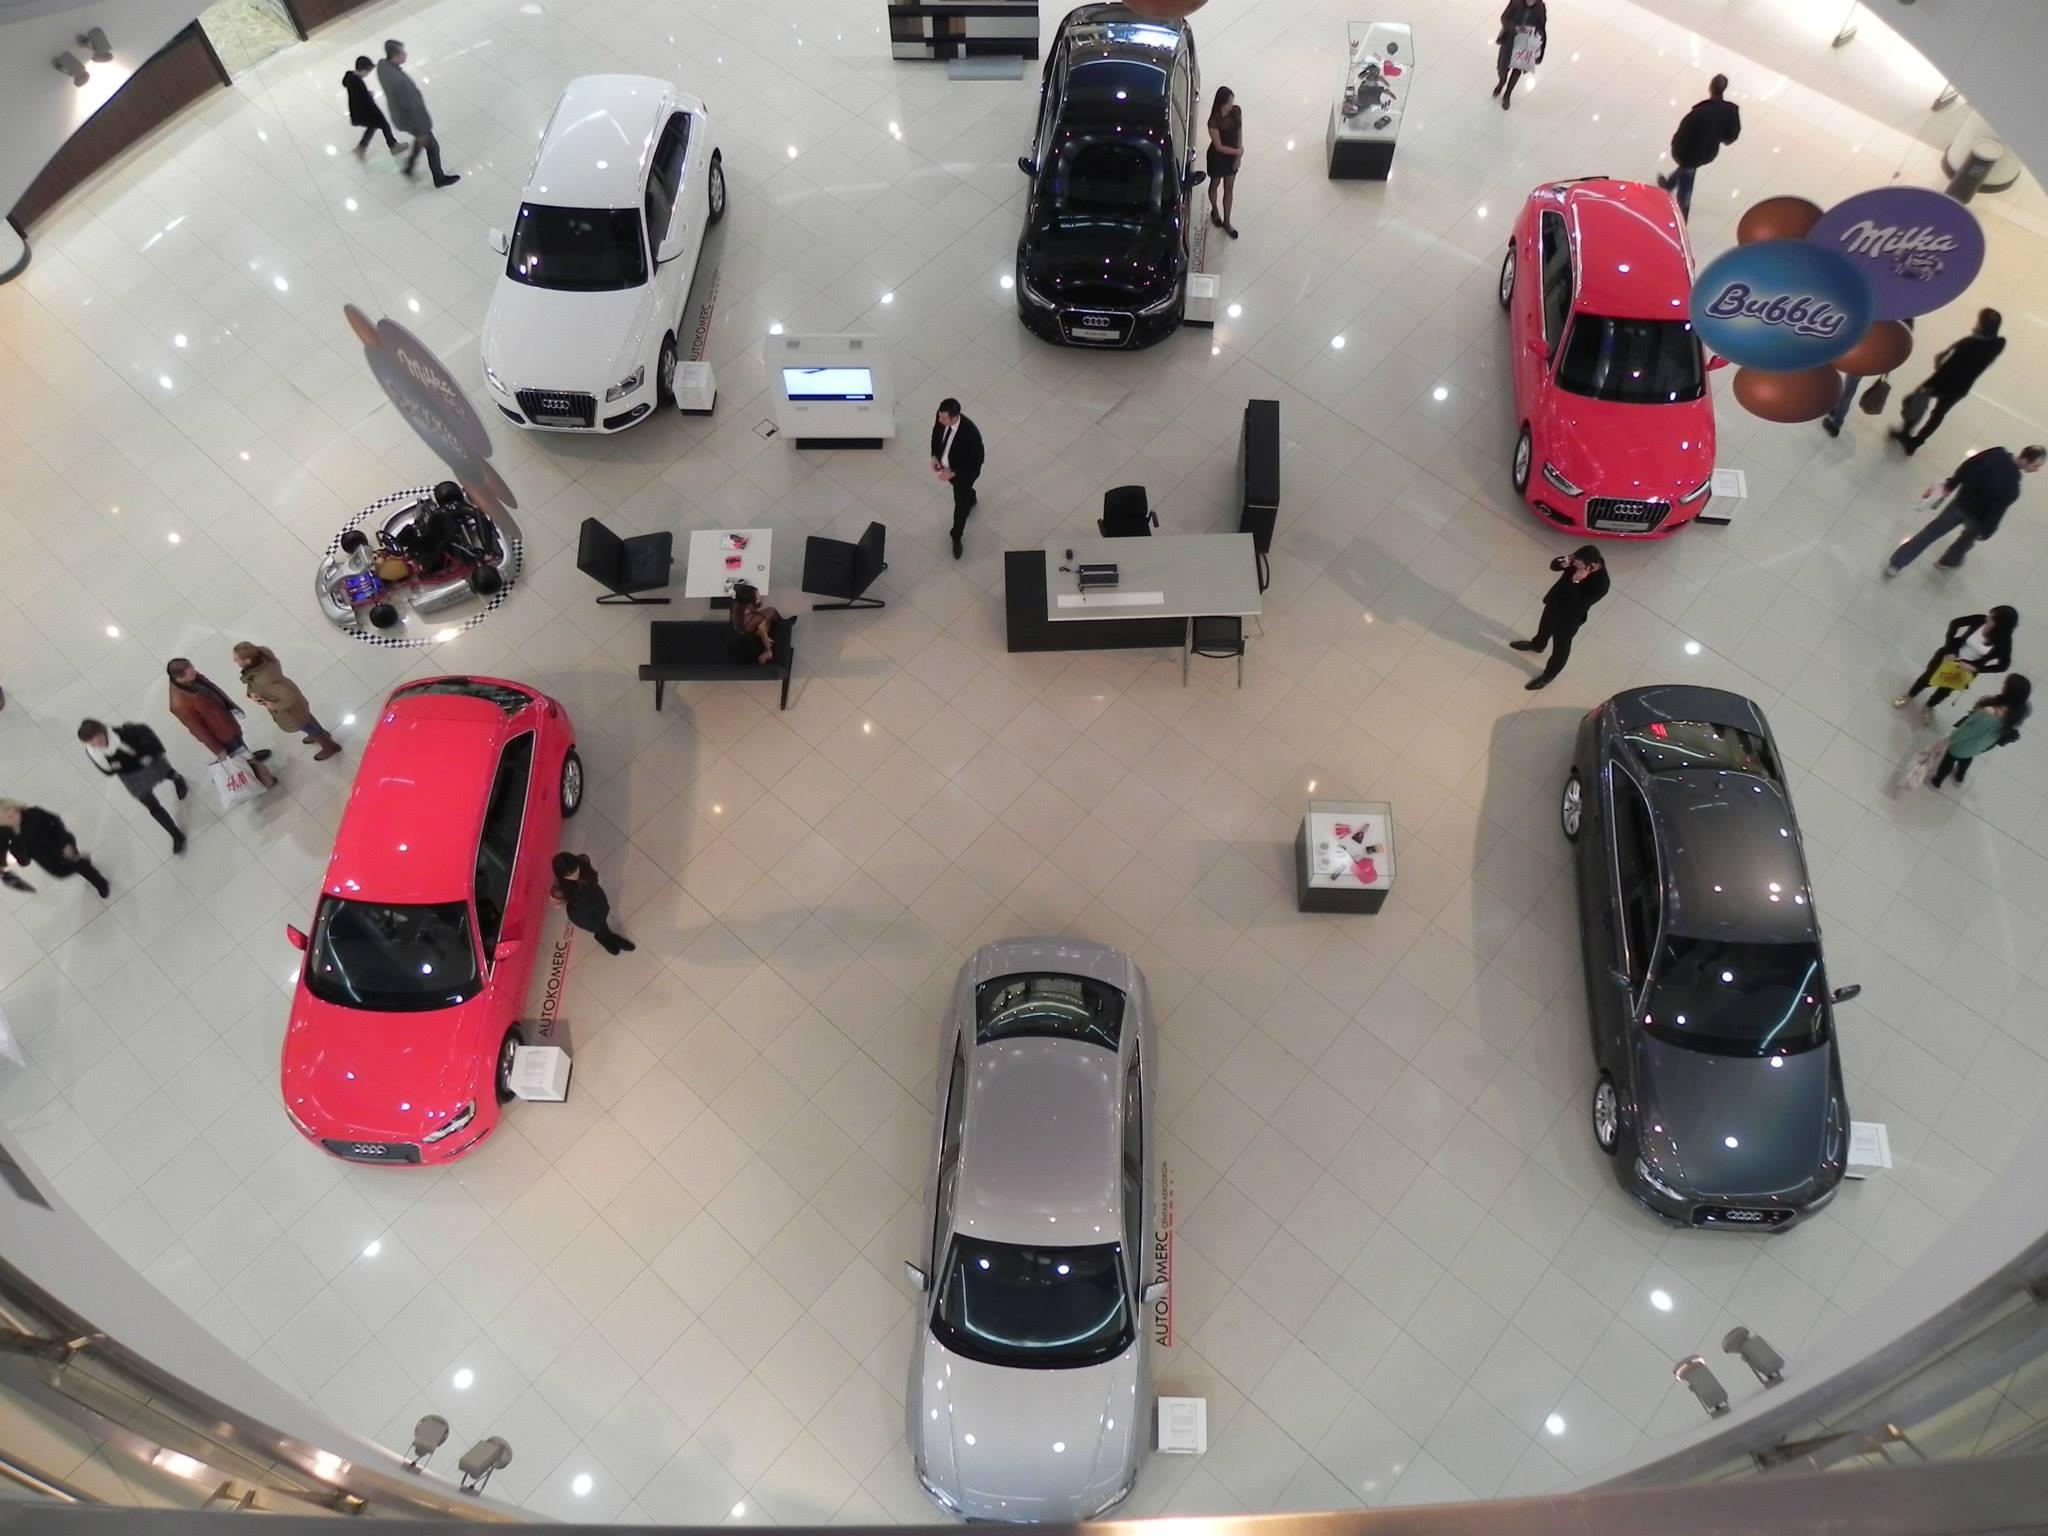 Autokomerc sajam automobila - Delta City